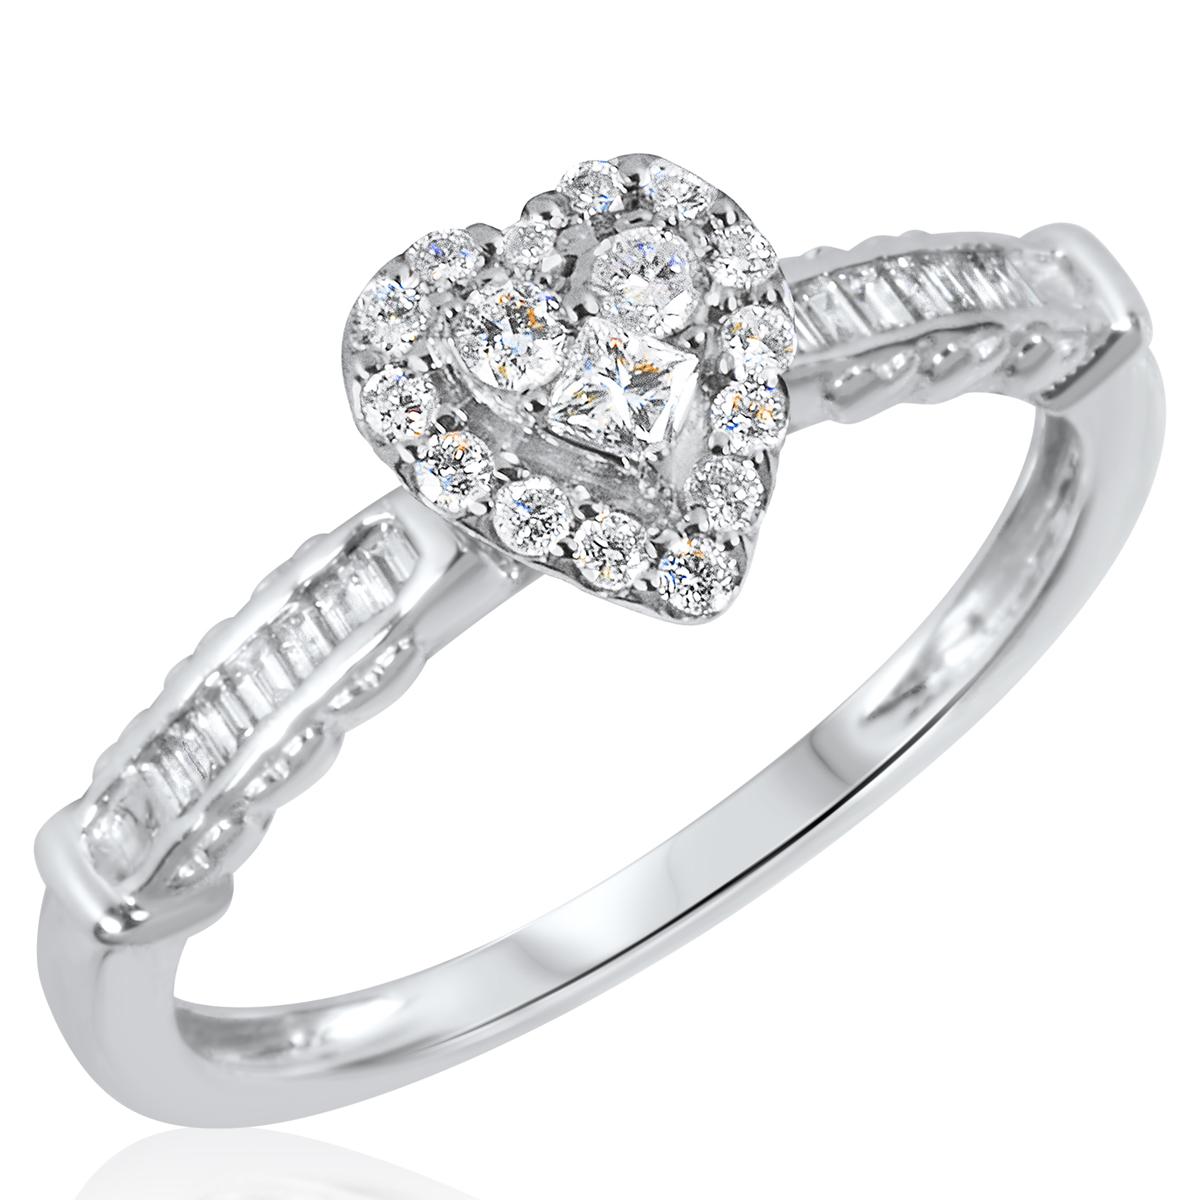 3/8 CT. T.W. Diamond Ladies Engagement Ring 10K White Gold- Size 8